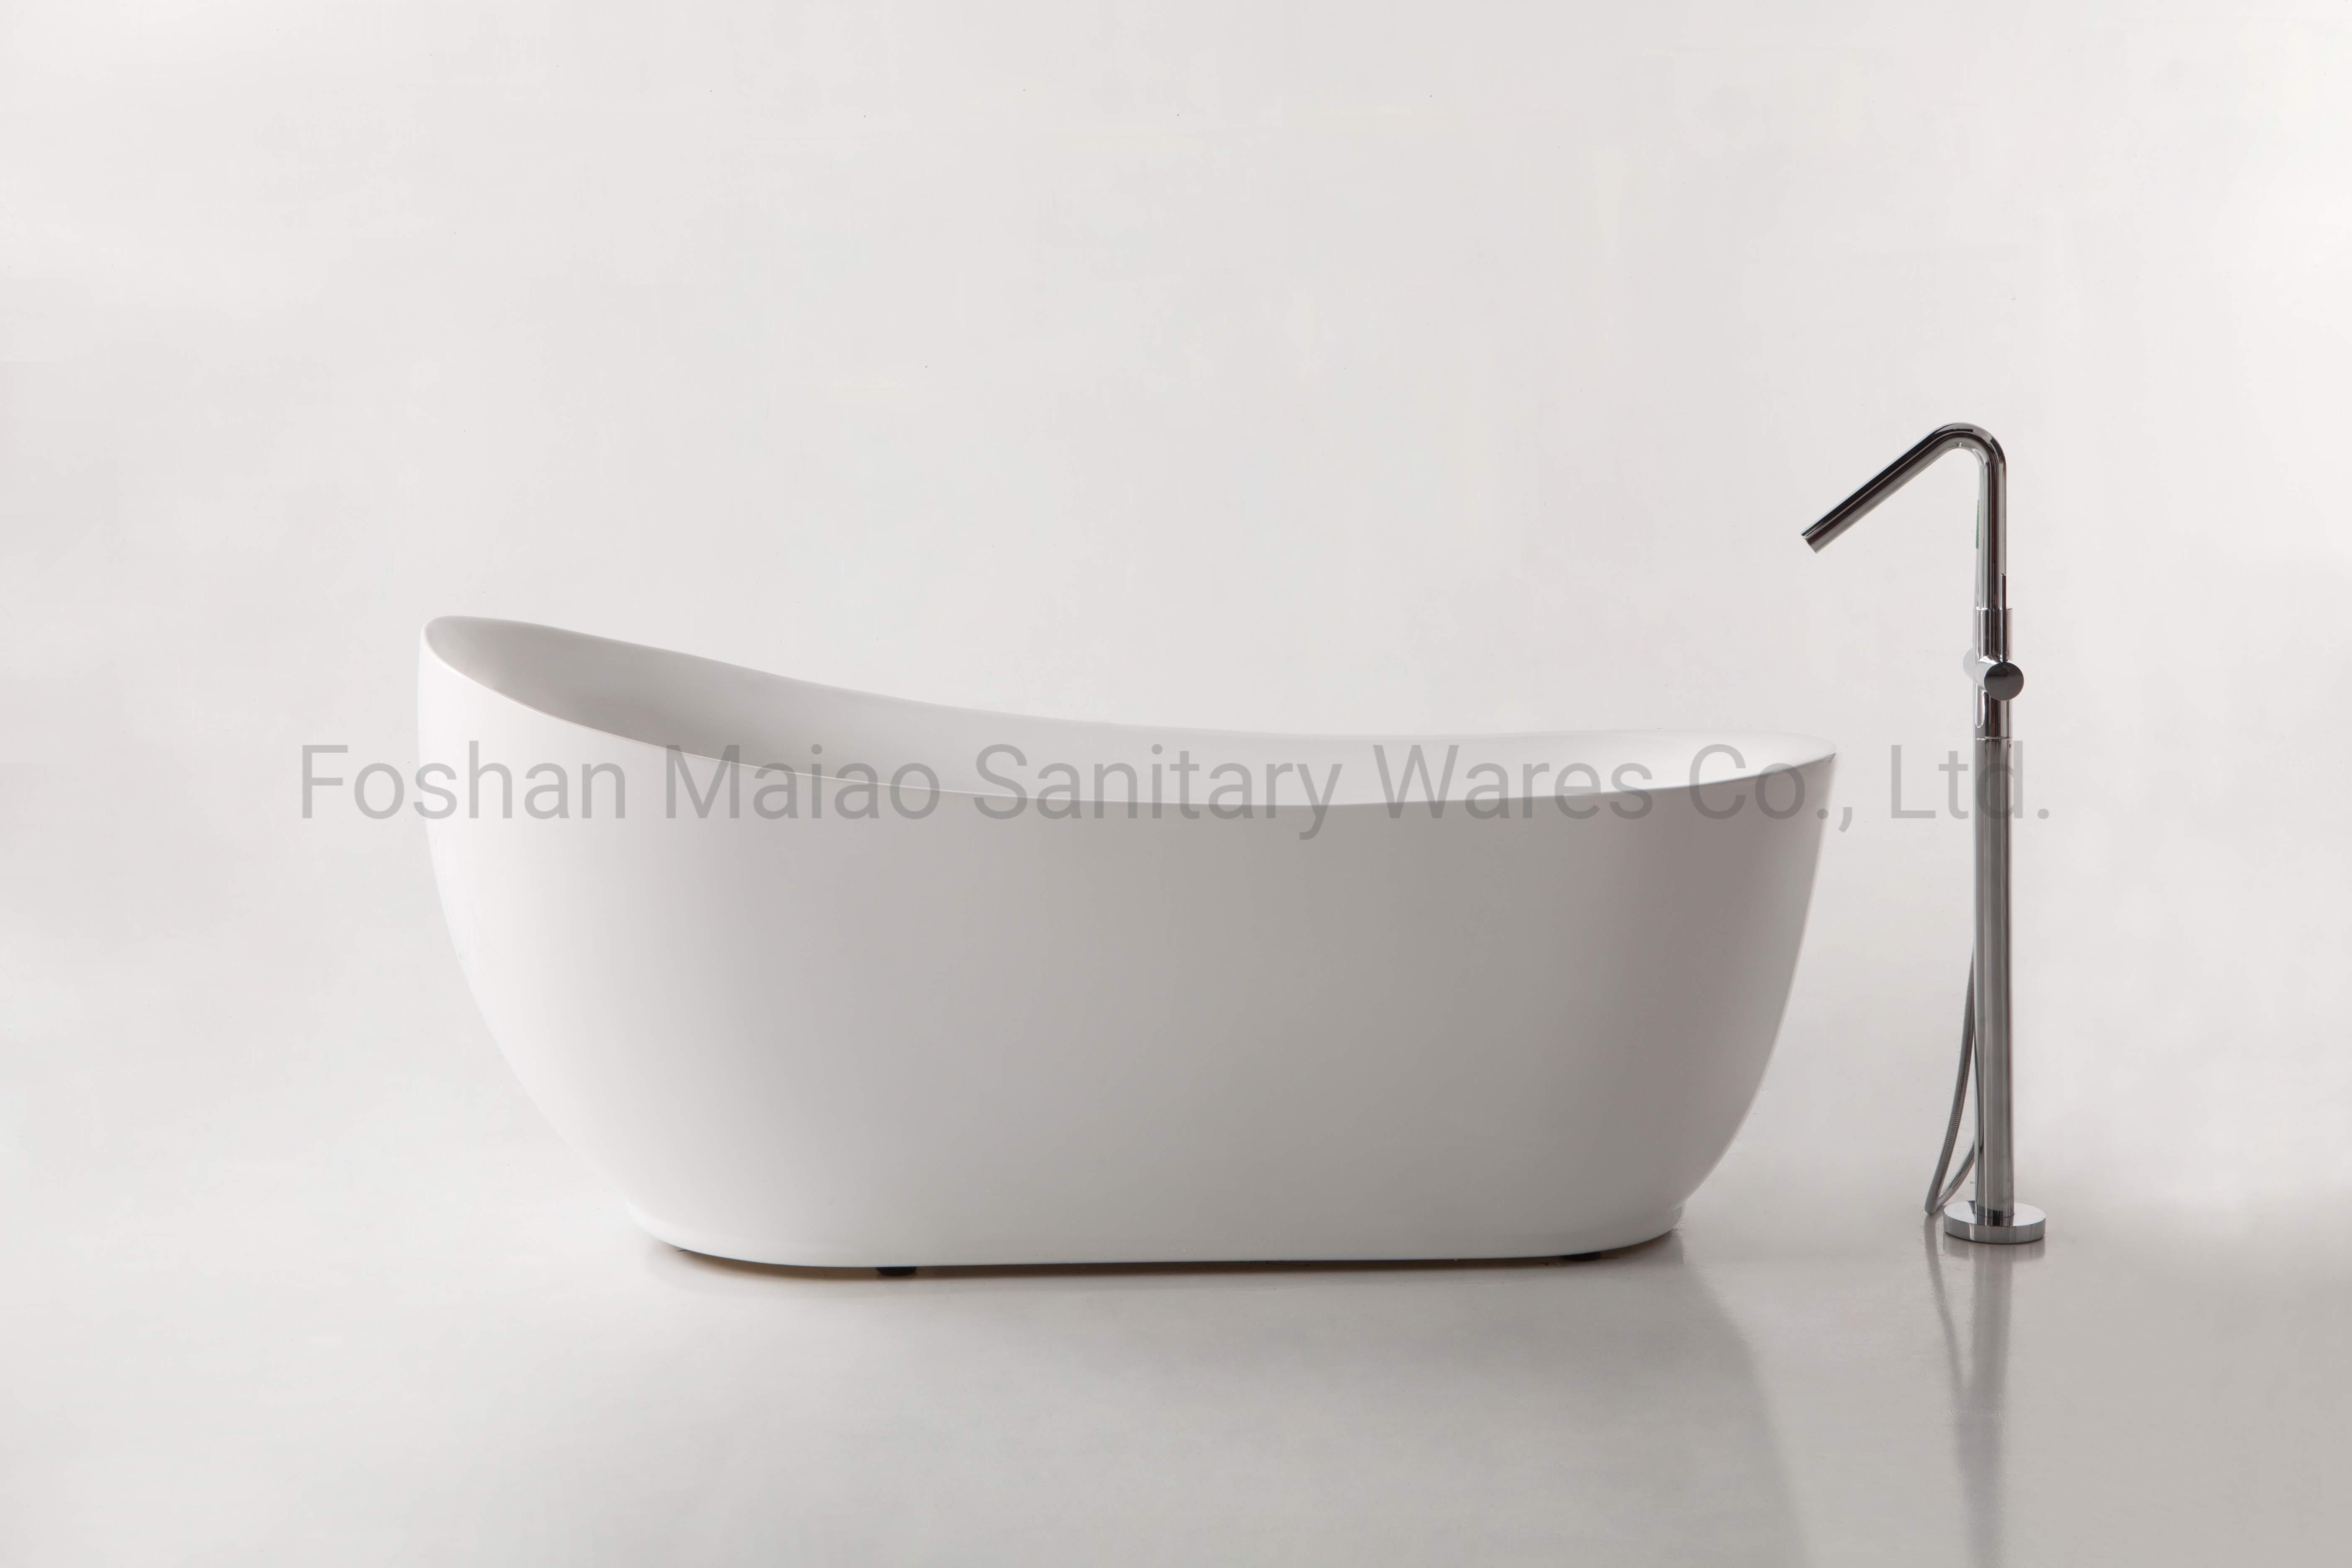 China Popular Antique Style Sanitary Ware Acrylic Freestanding Bathtub Ba 8208 China Freestanding Bathtub Bathtub